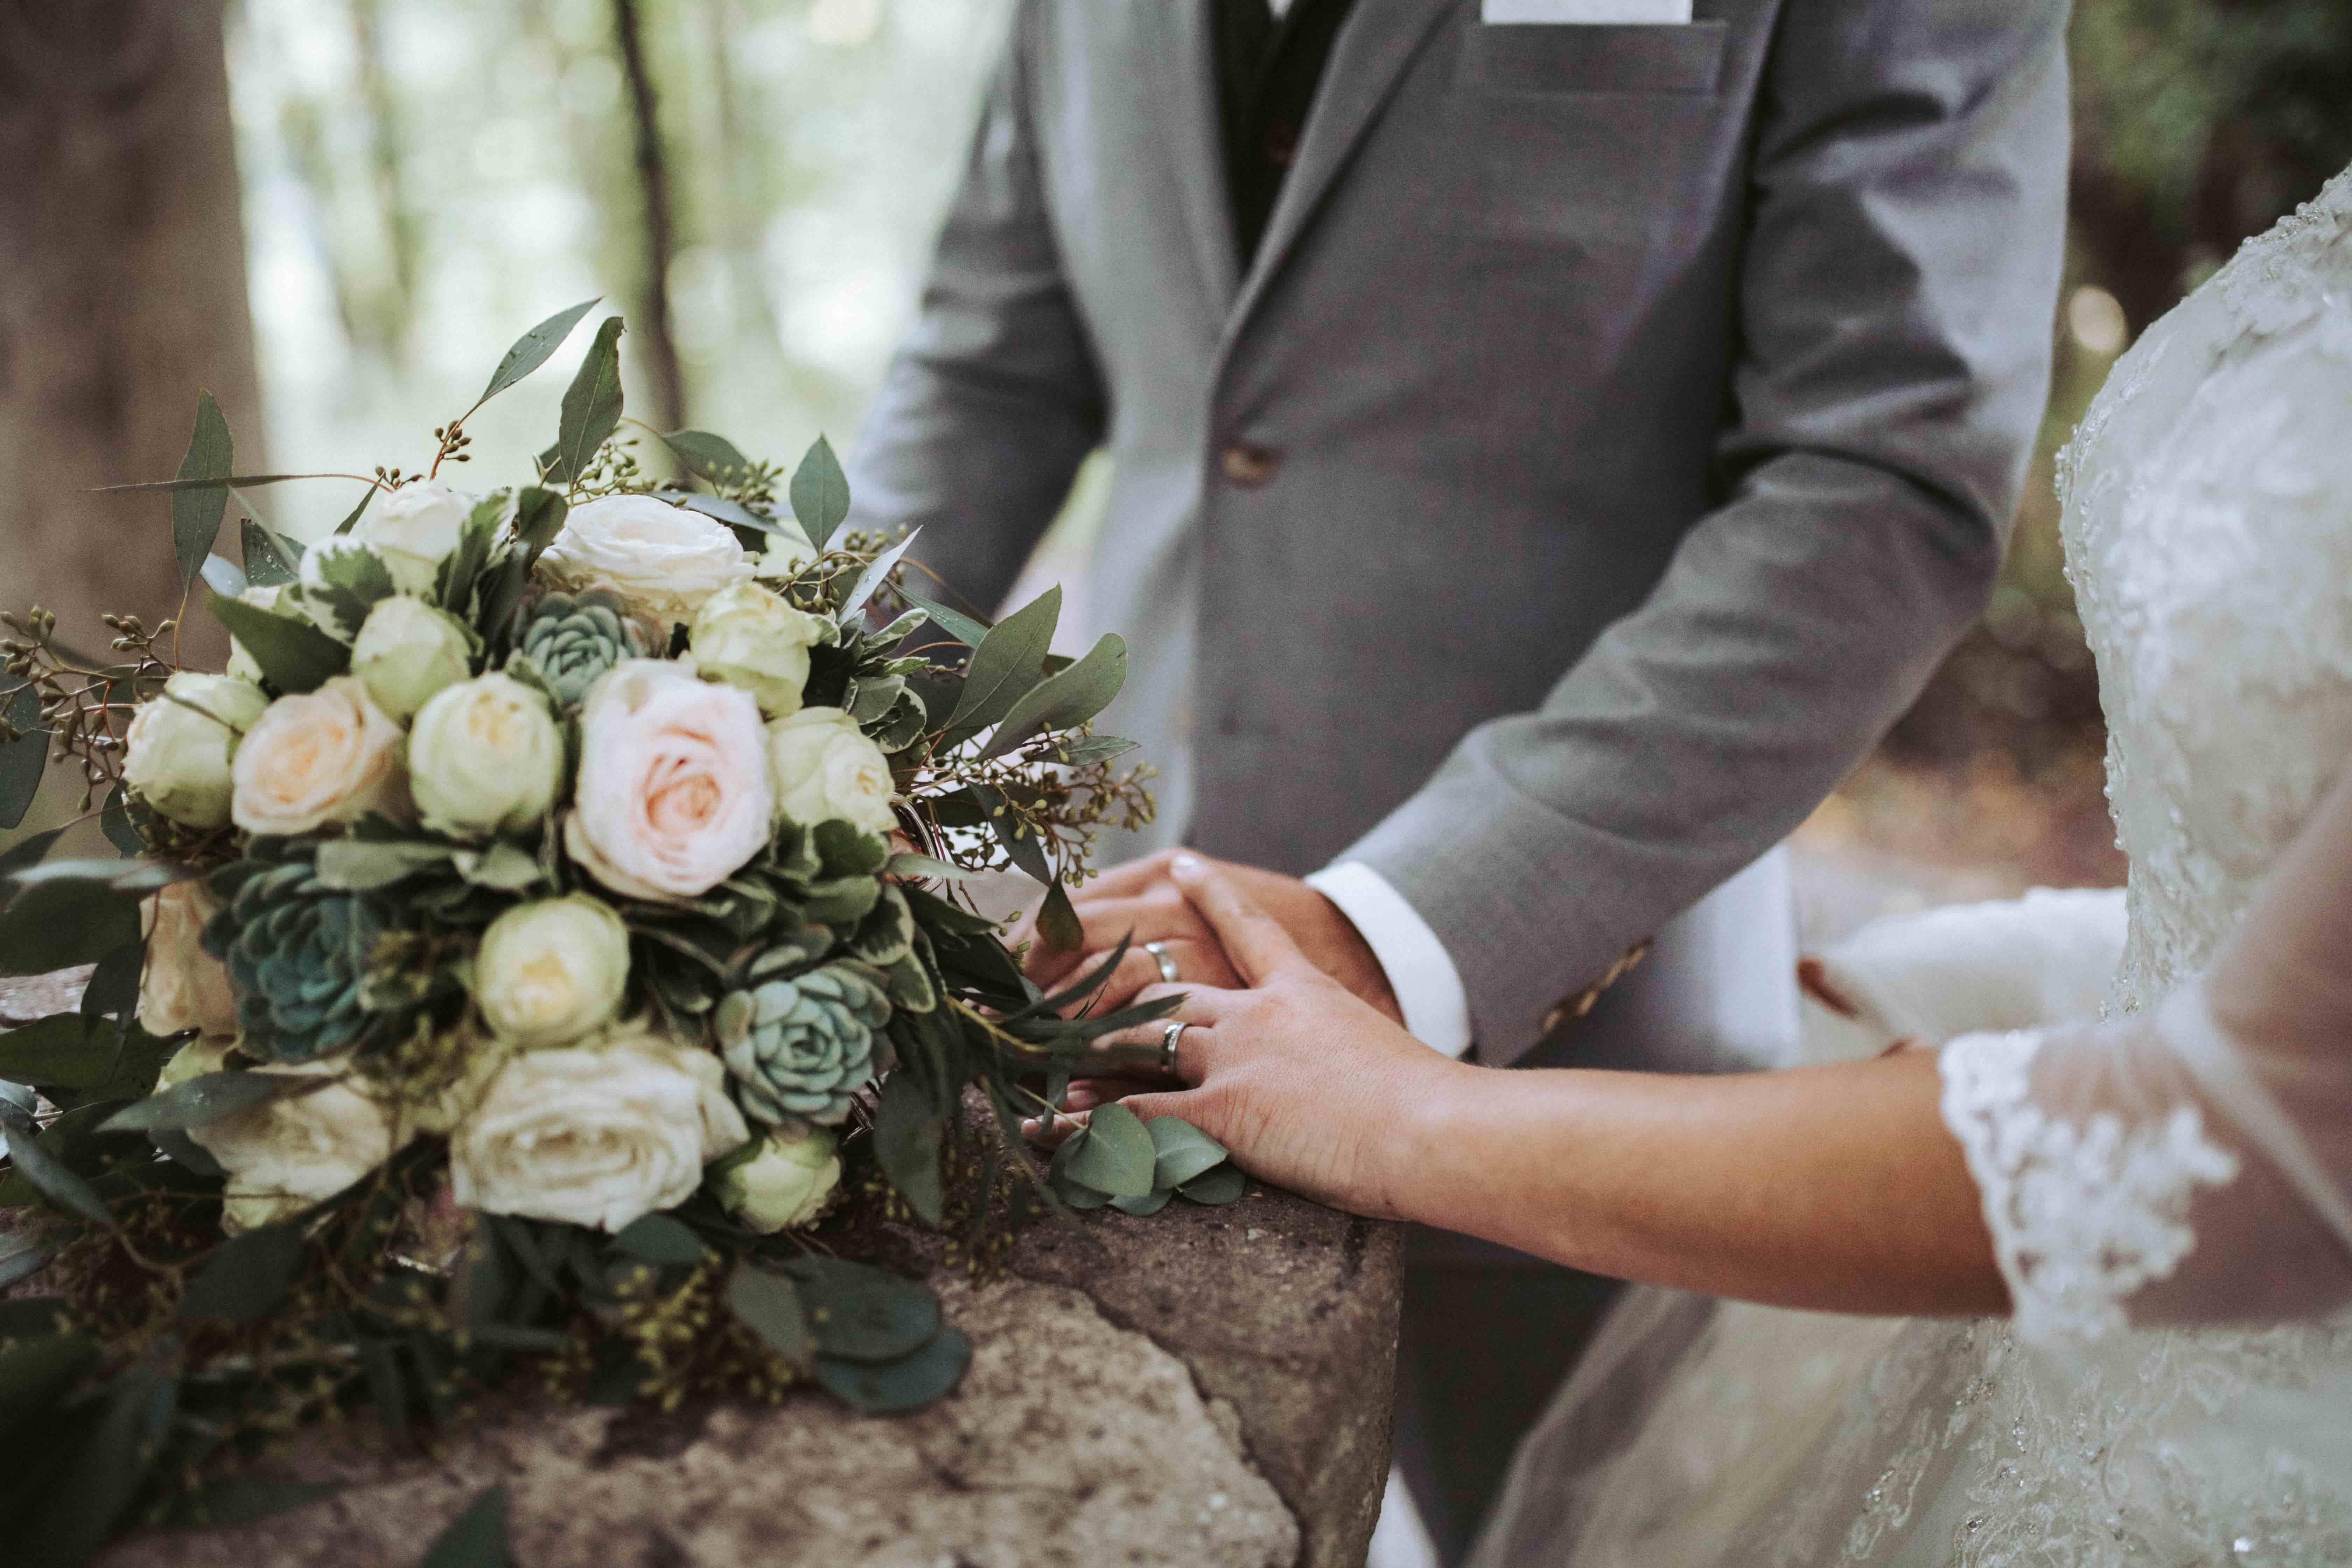 Kontakt Golprinz Event- & Hochzeitsfotografie